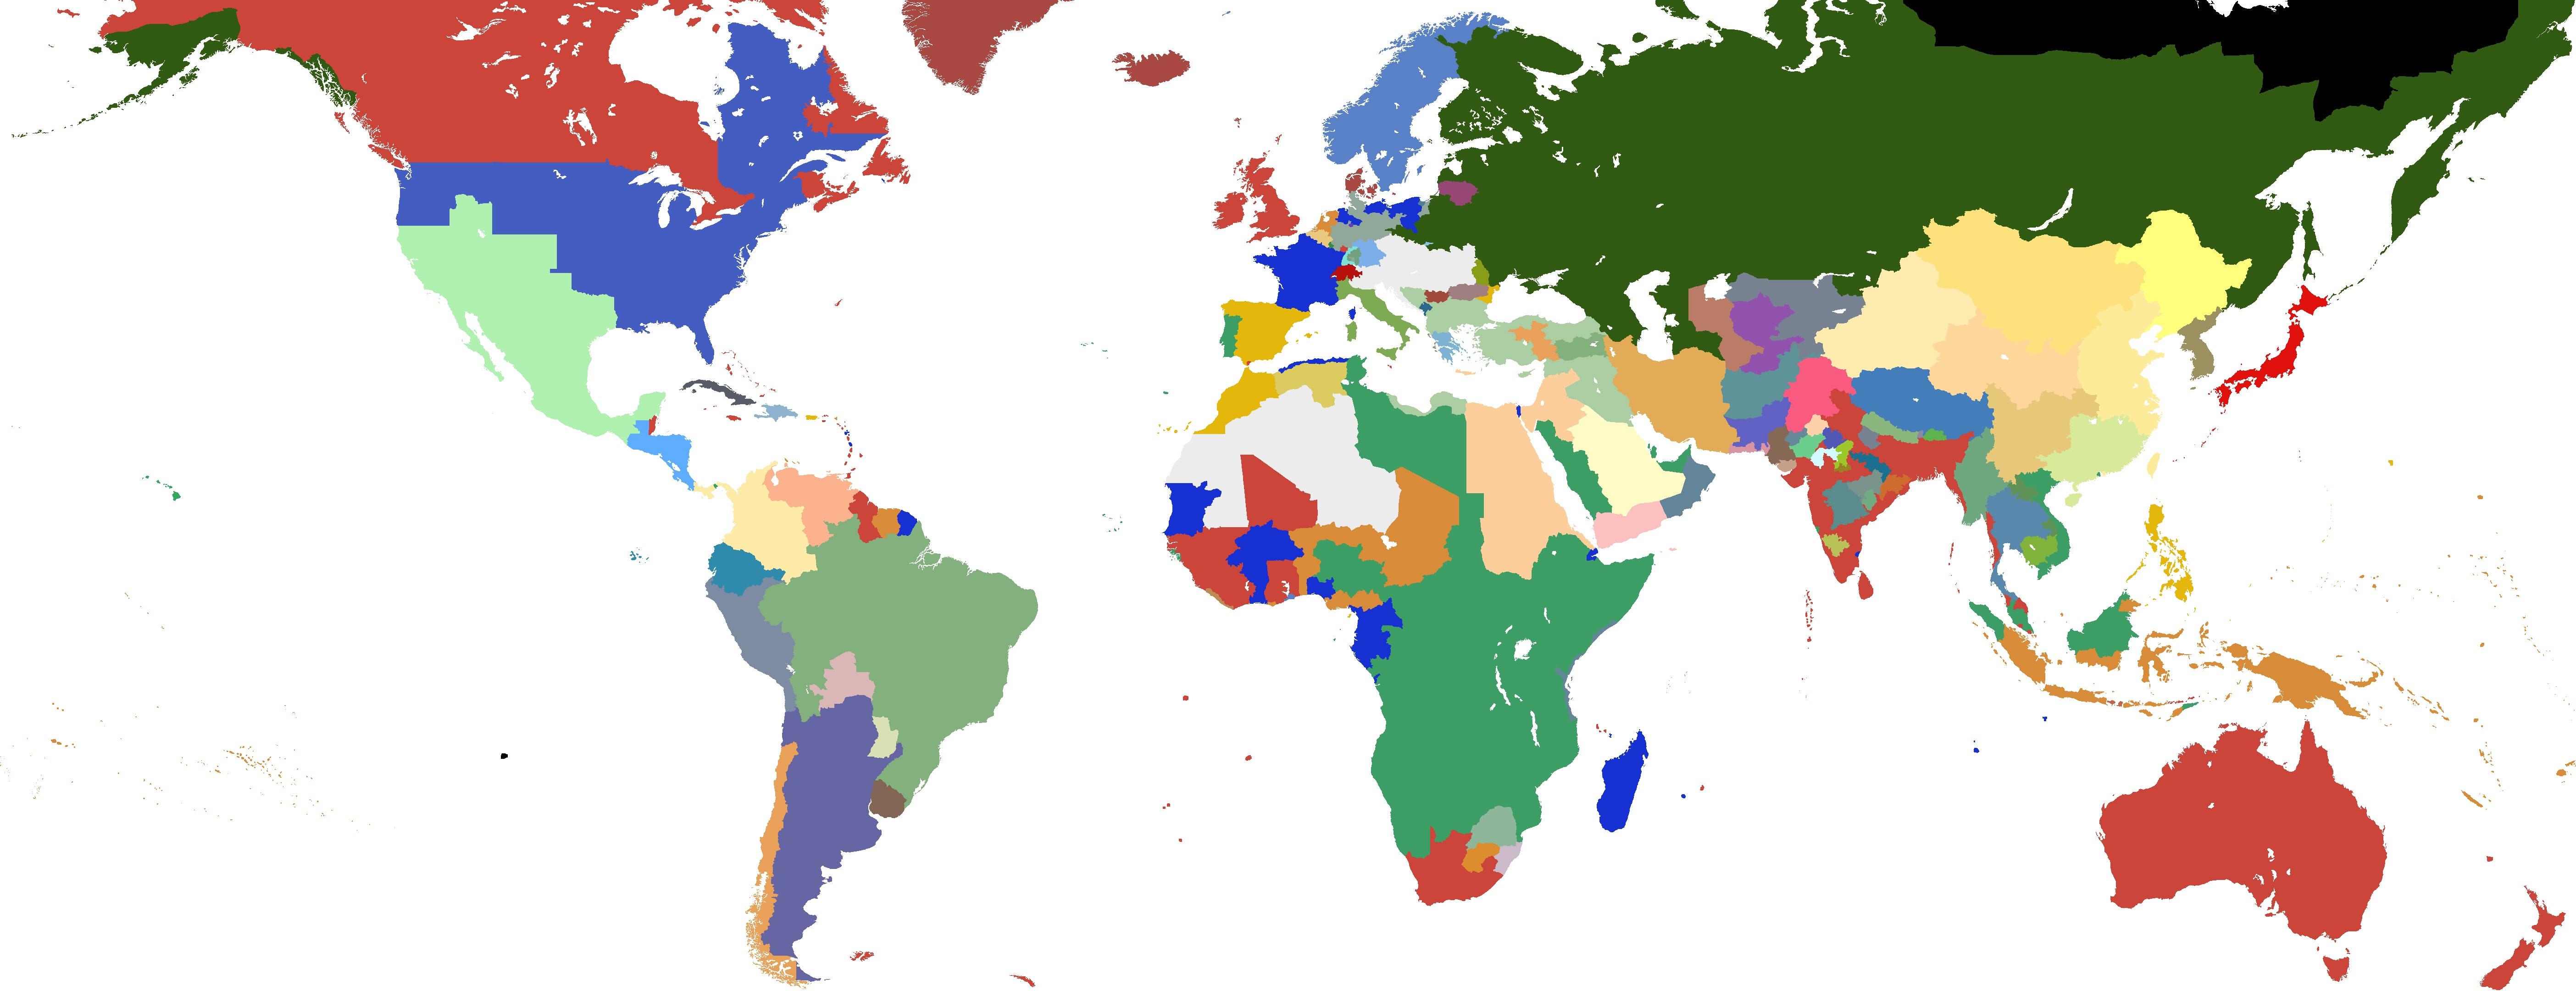 V2_MAP_POR_1899.4.6_1.jpg